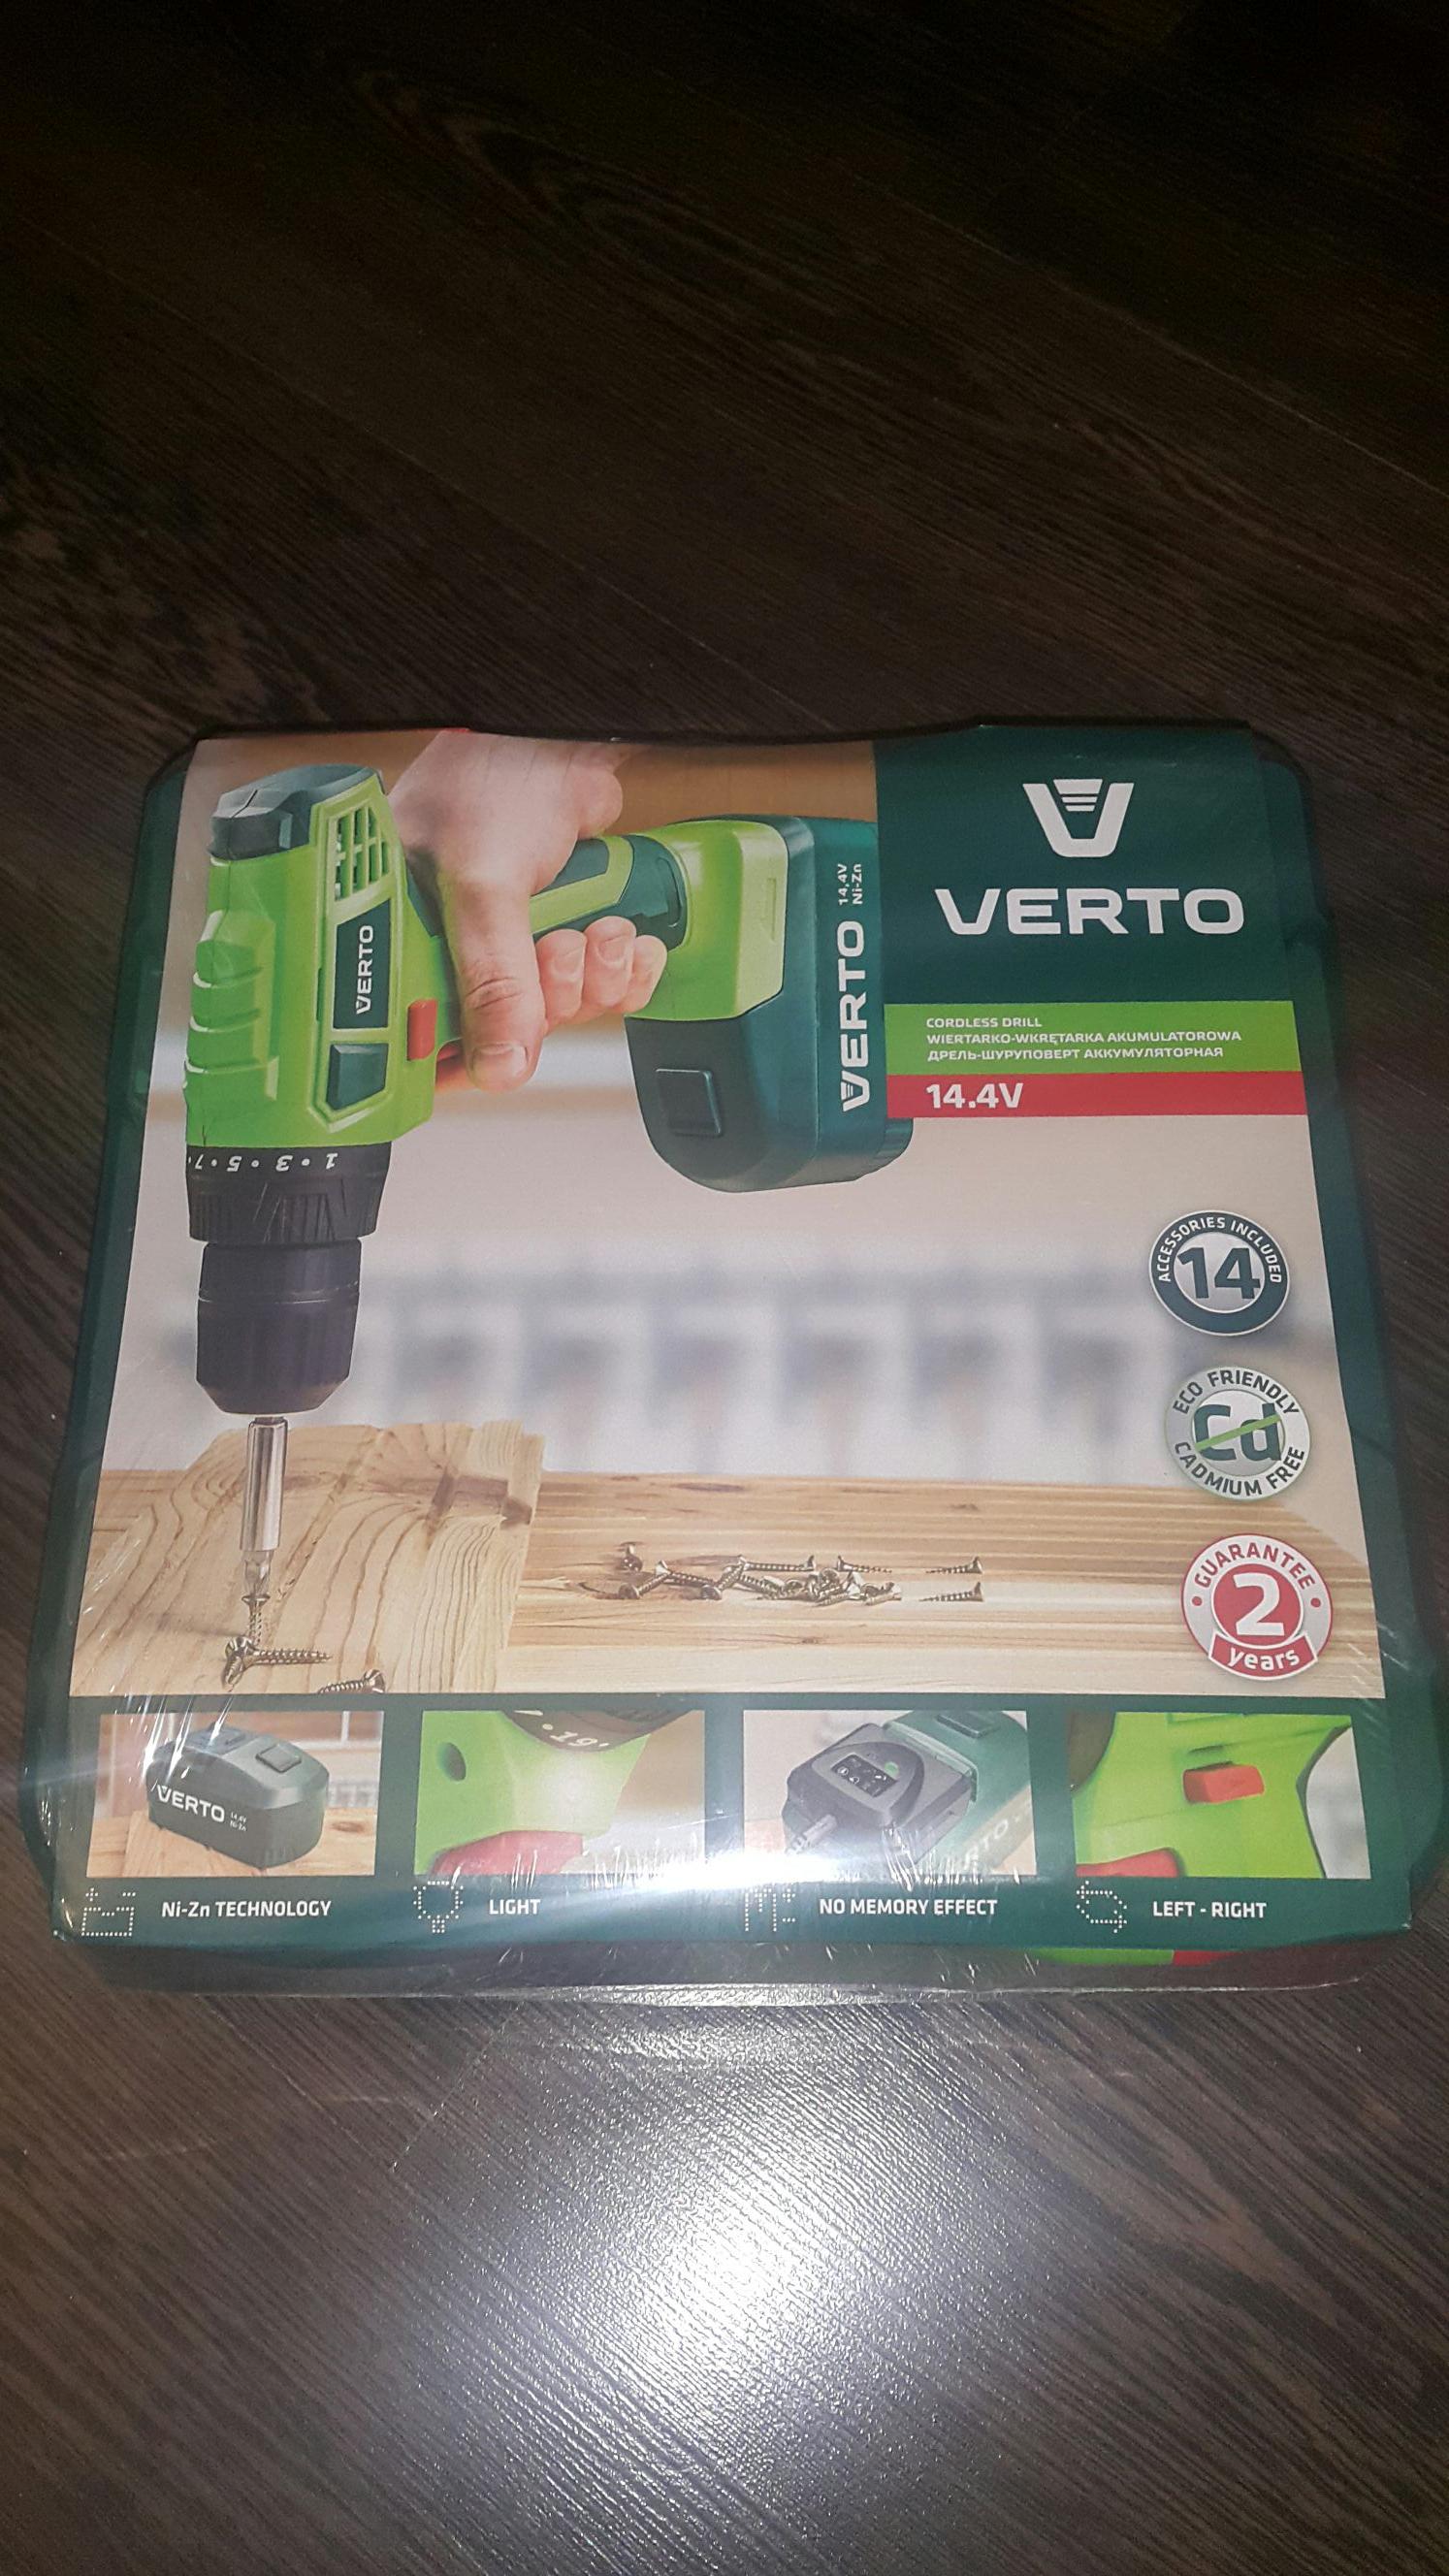 Wiertarko-wkrętarka VERTO 50G185 14.4V Kaufland